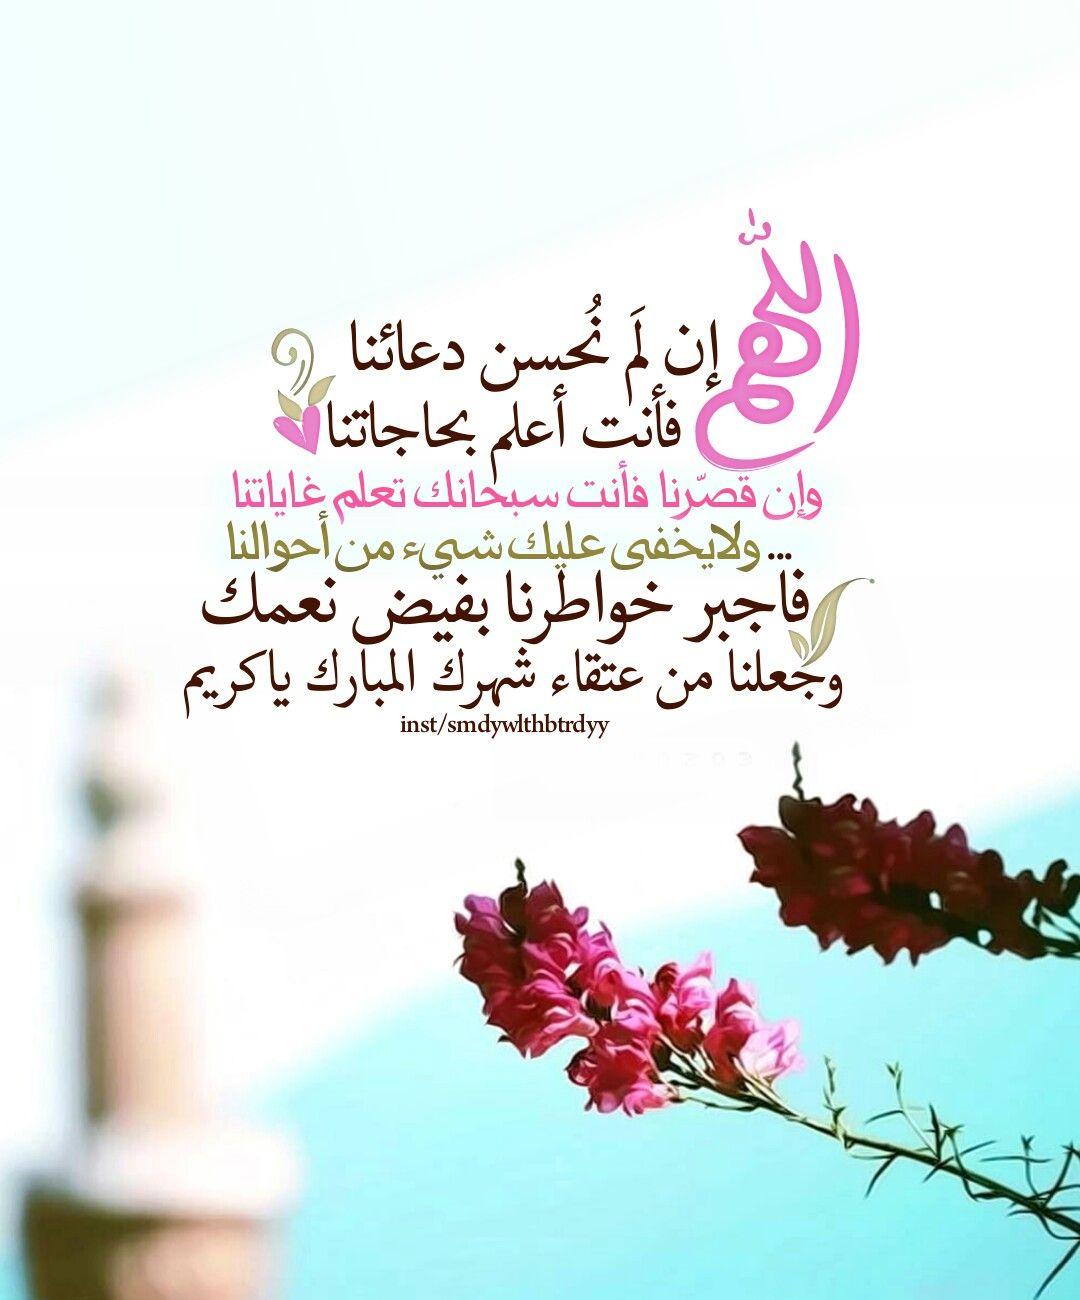 Pin By Um Ahmad On الصباح والمساء Romantic Love Quotes Ramadan Quran Quotes